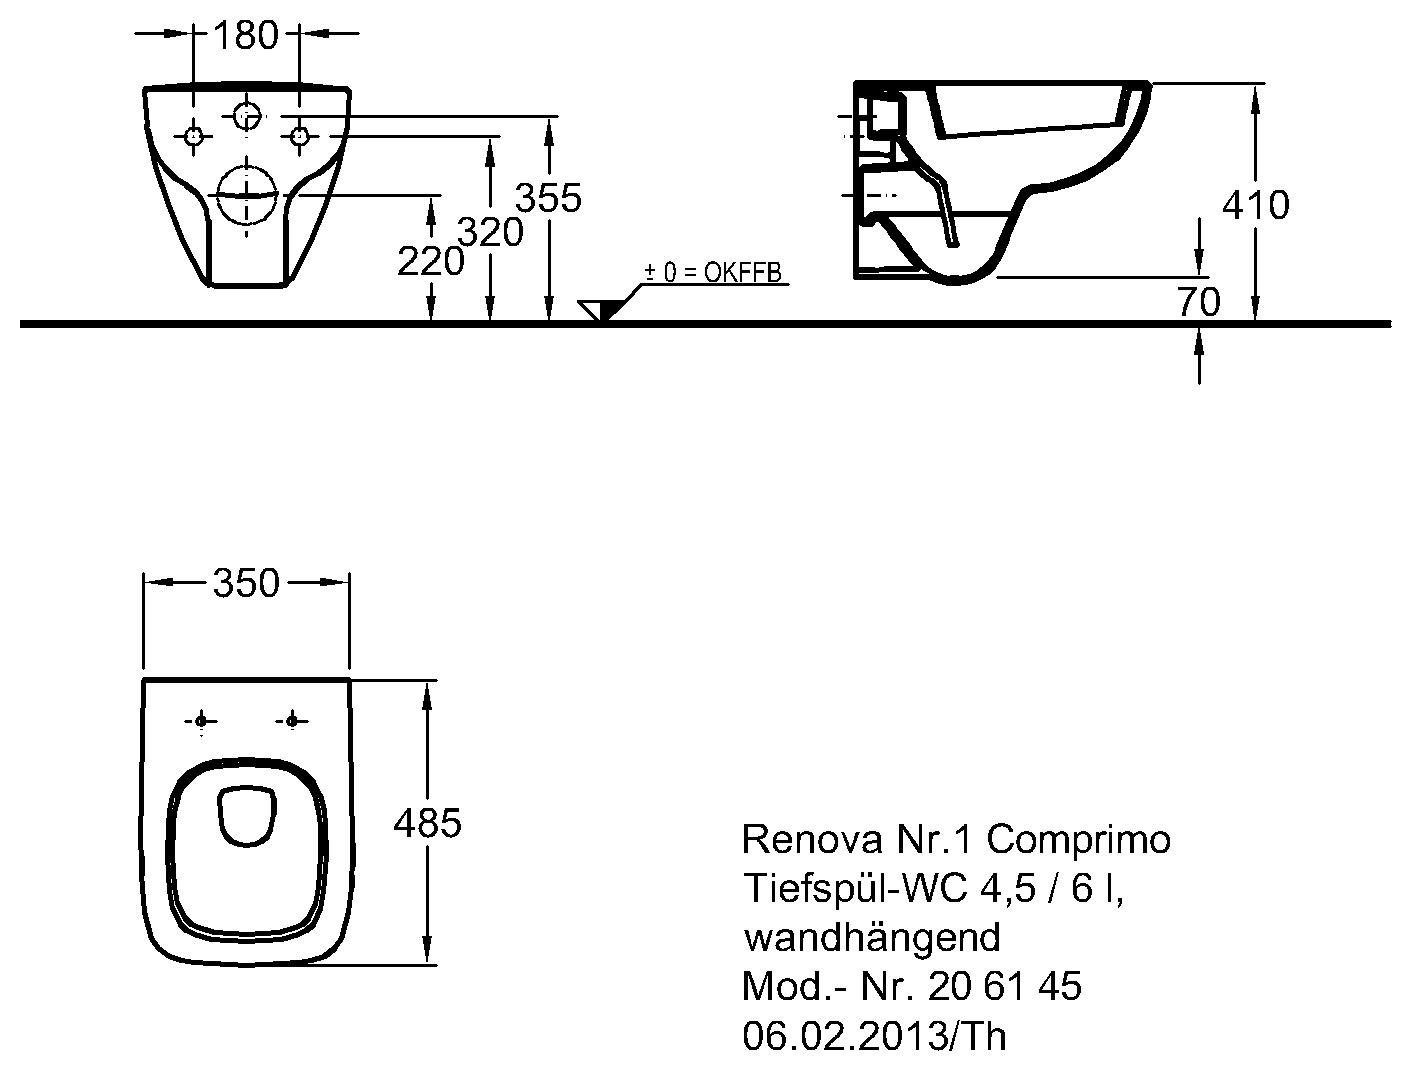 keramag renova nr 1 comprimo tiefsp l wc wandh ngend. Black Bedroom Furniture Sets. Home Design Ideas